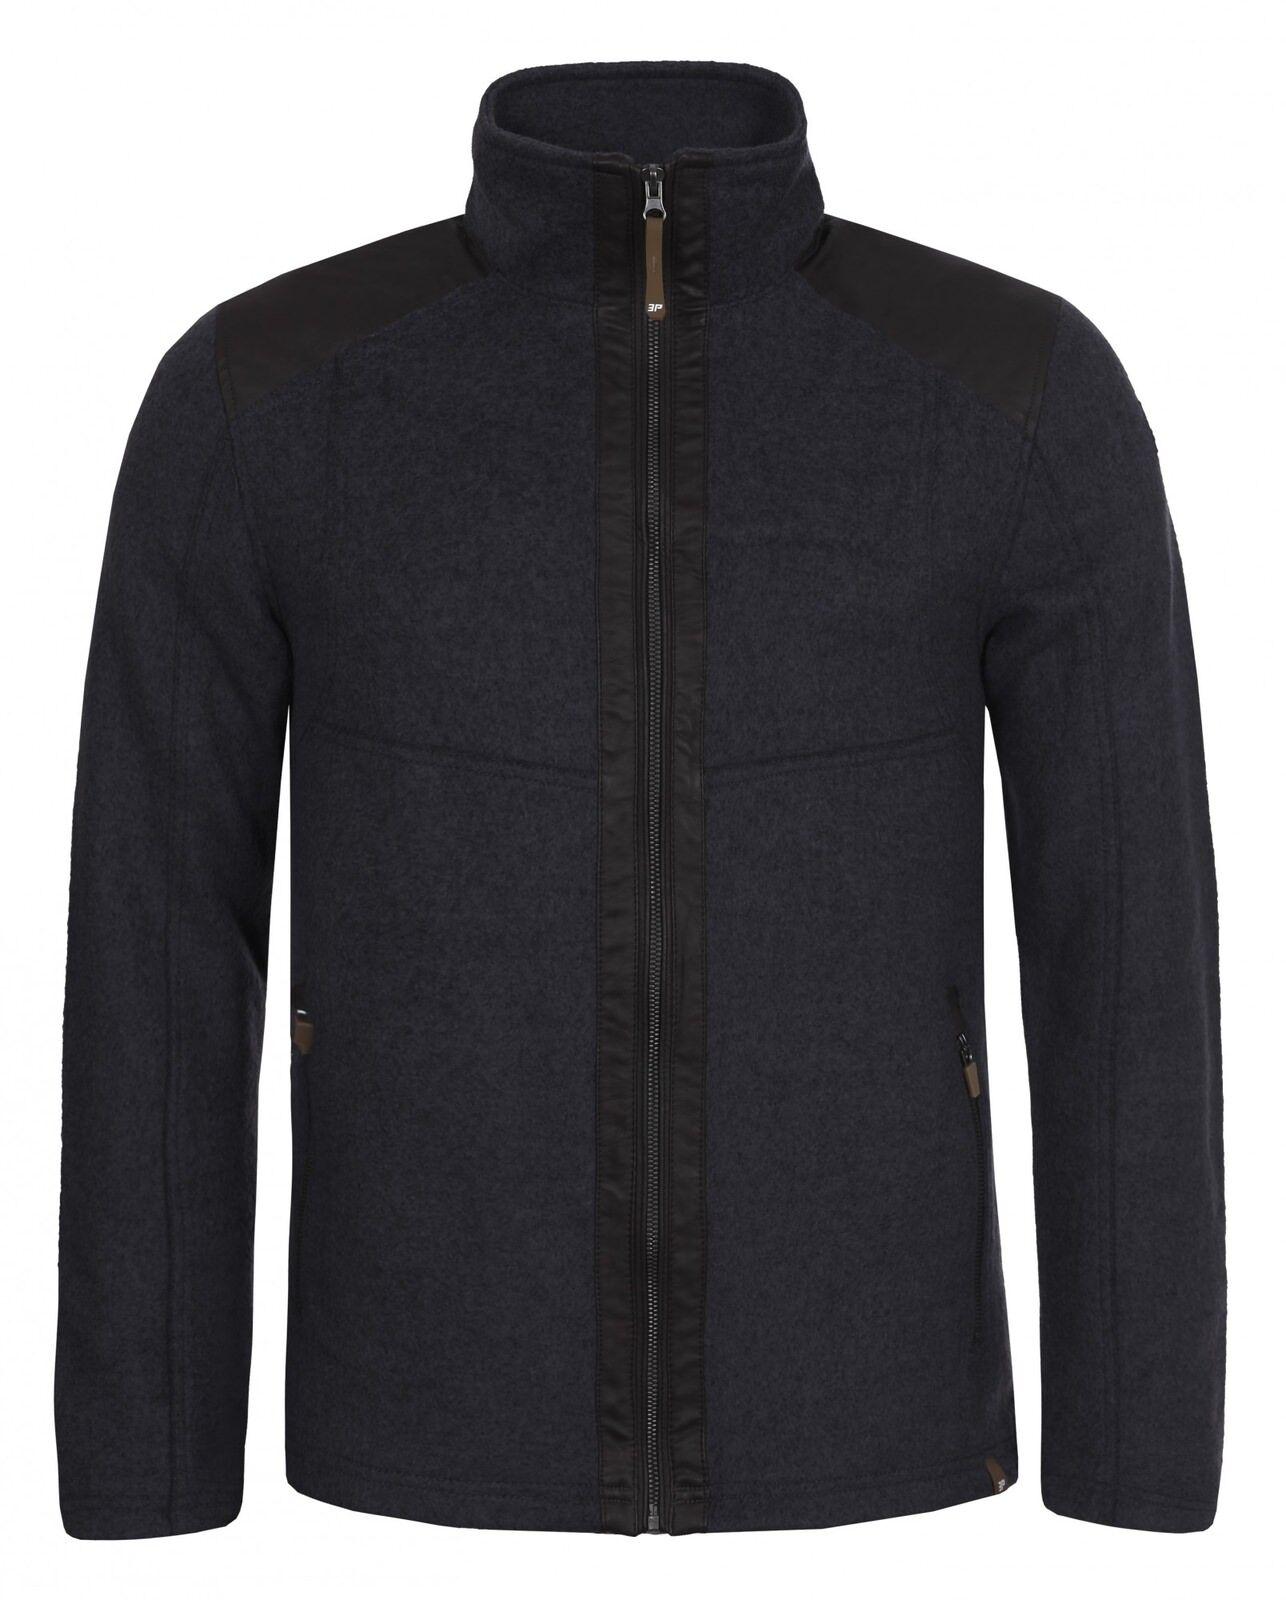 ICEPEAK giacca TALBOT Giacca da uomo giacca da esterno